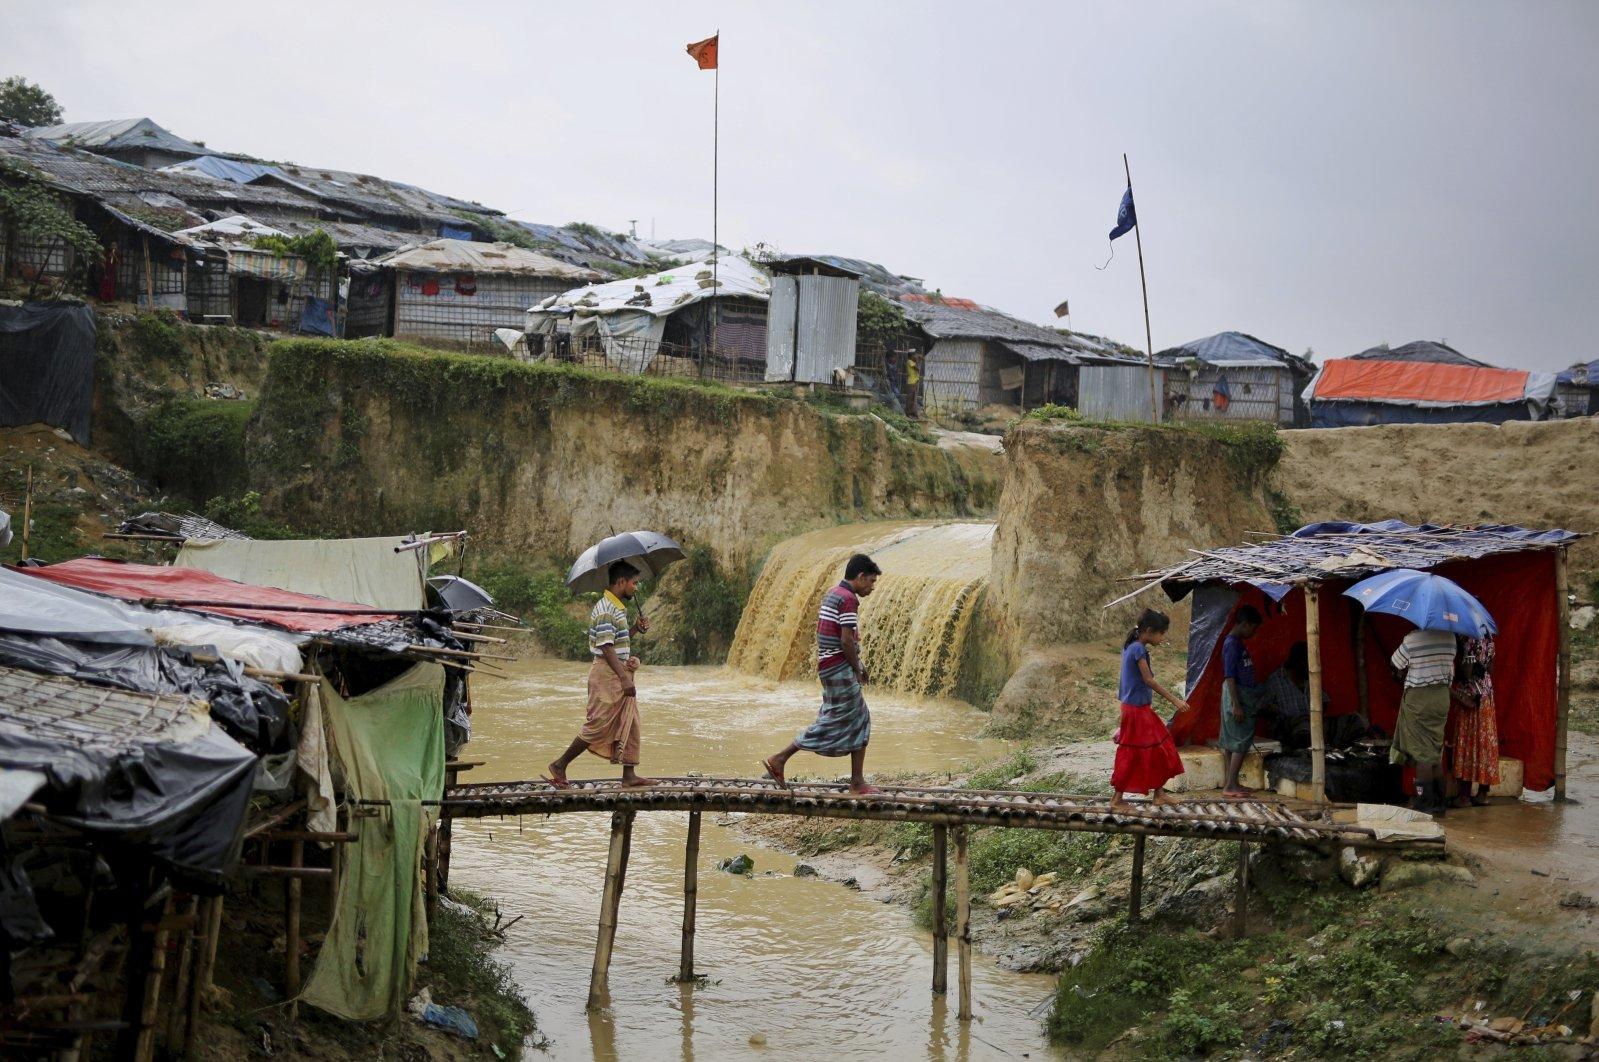 Sewer water flows in the back as Rohingya refugees cross a makeshift bamboo bridge at Kutupalong refugee camp, Bangladesh, Aug. 28, 2018. (AP Photo)